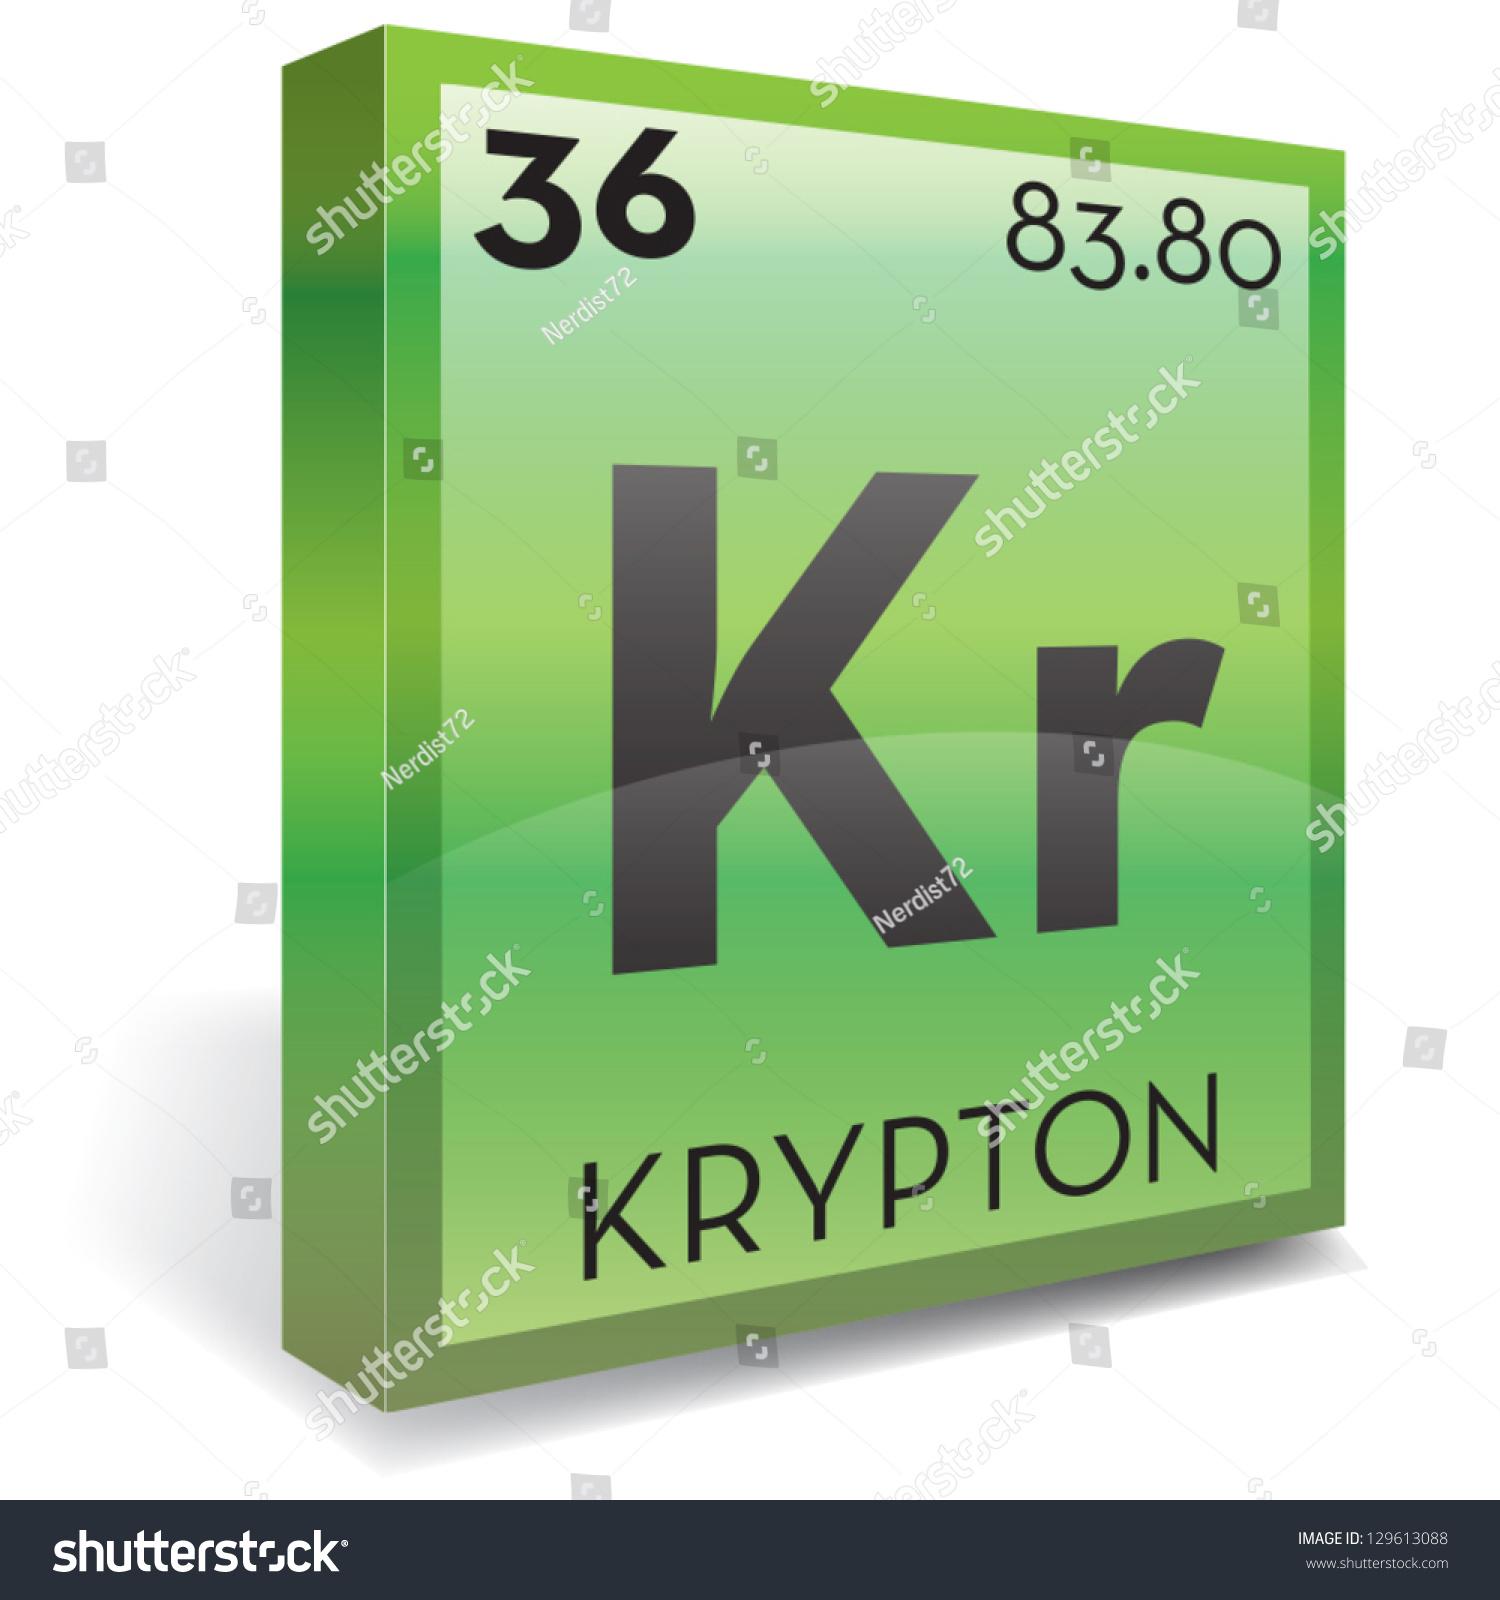 Krypton symbol krypton spanish language it project management life krypton element stock vector 129613088 shutterstock stock vector krypton element 129613088 krypton element 129613088 krypton symbol krypton spanish gamestrikefo Images